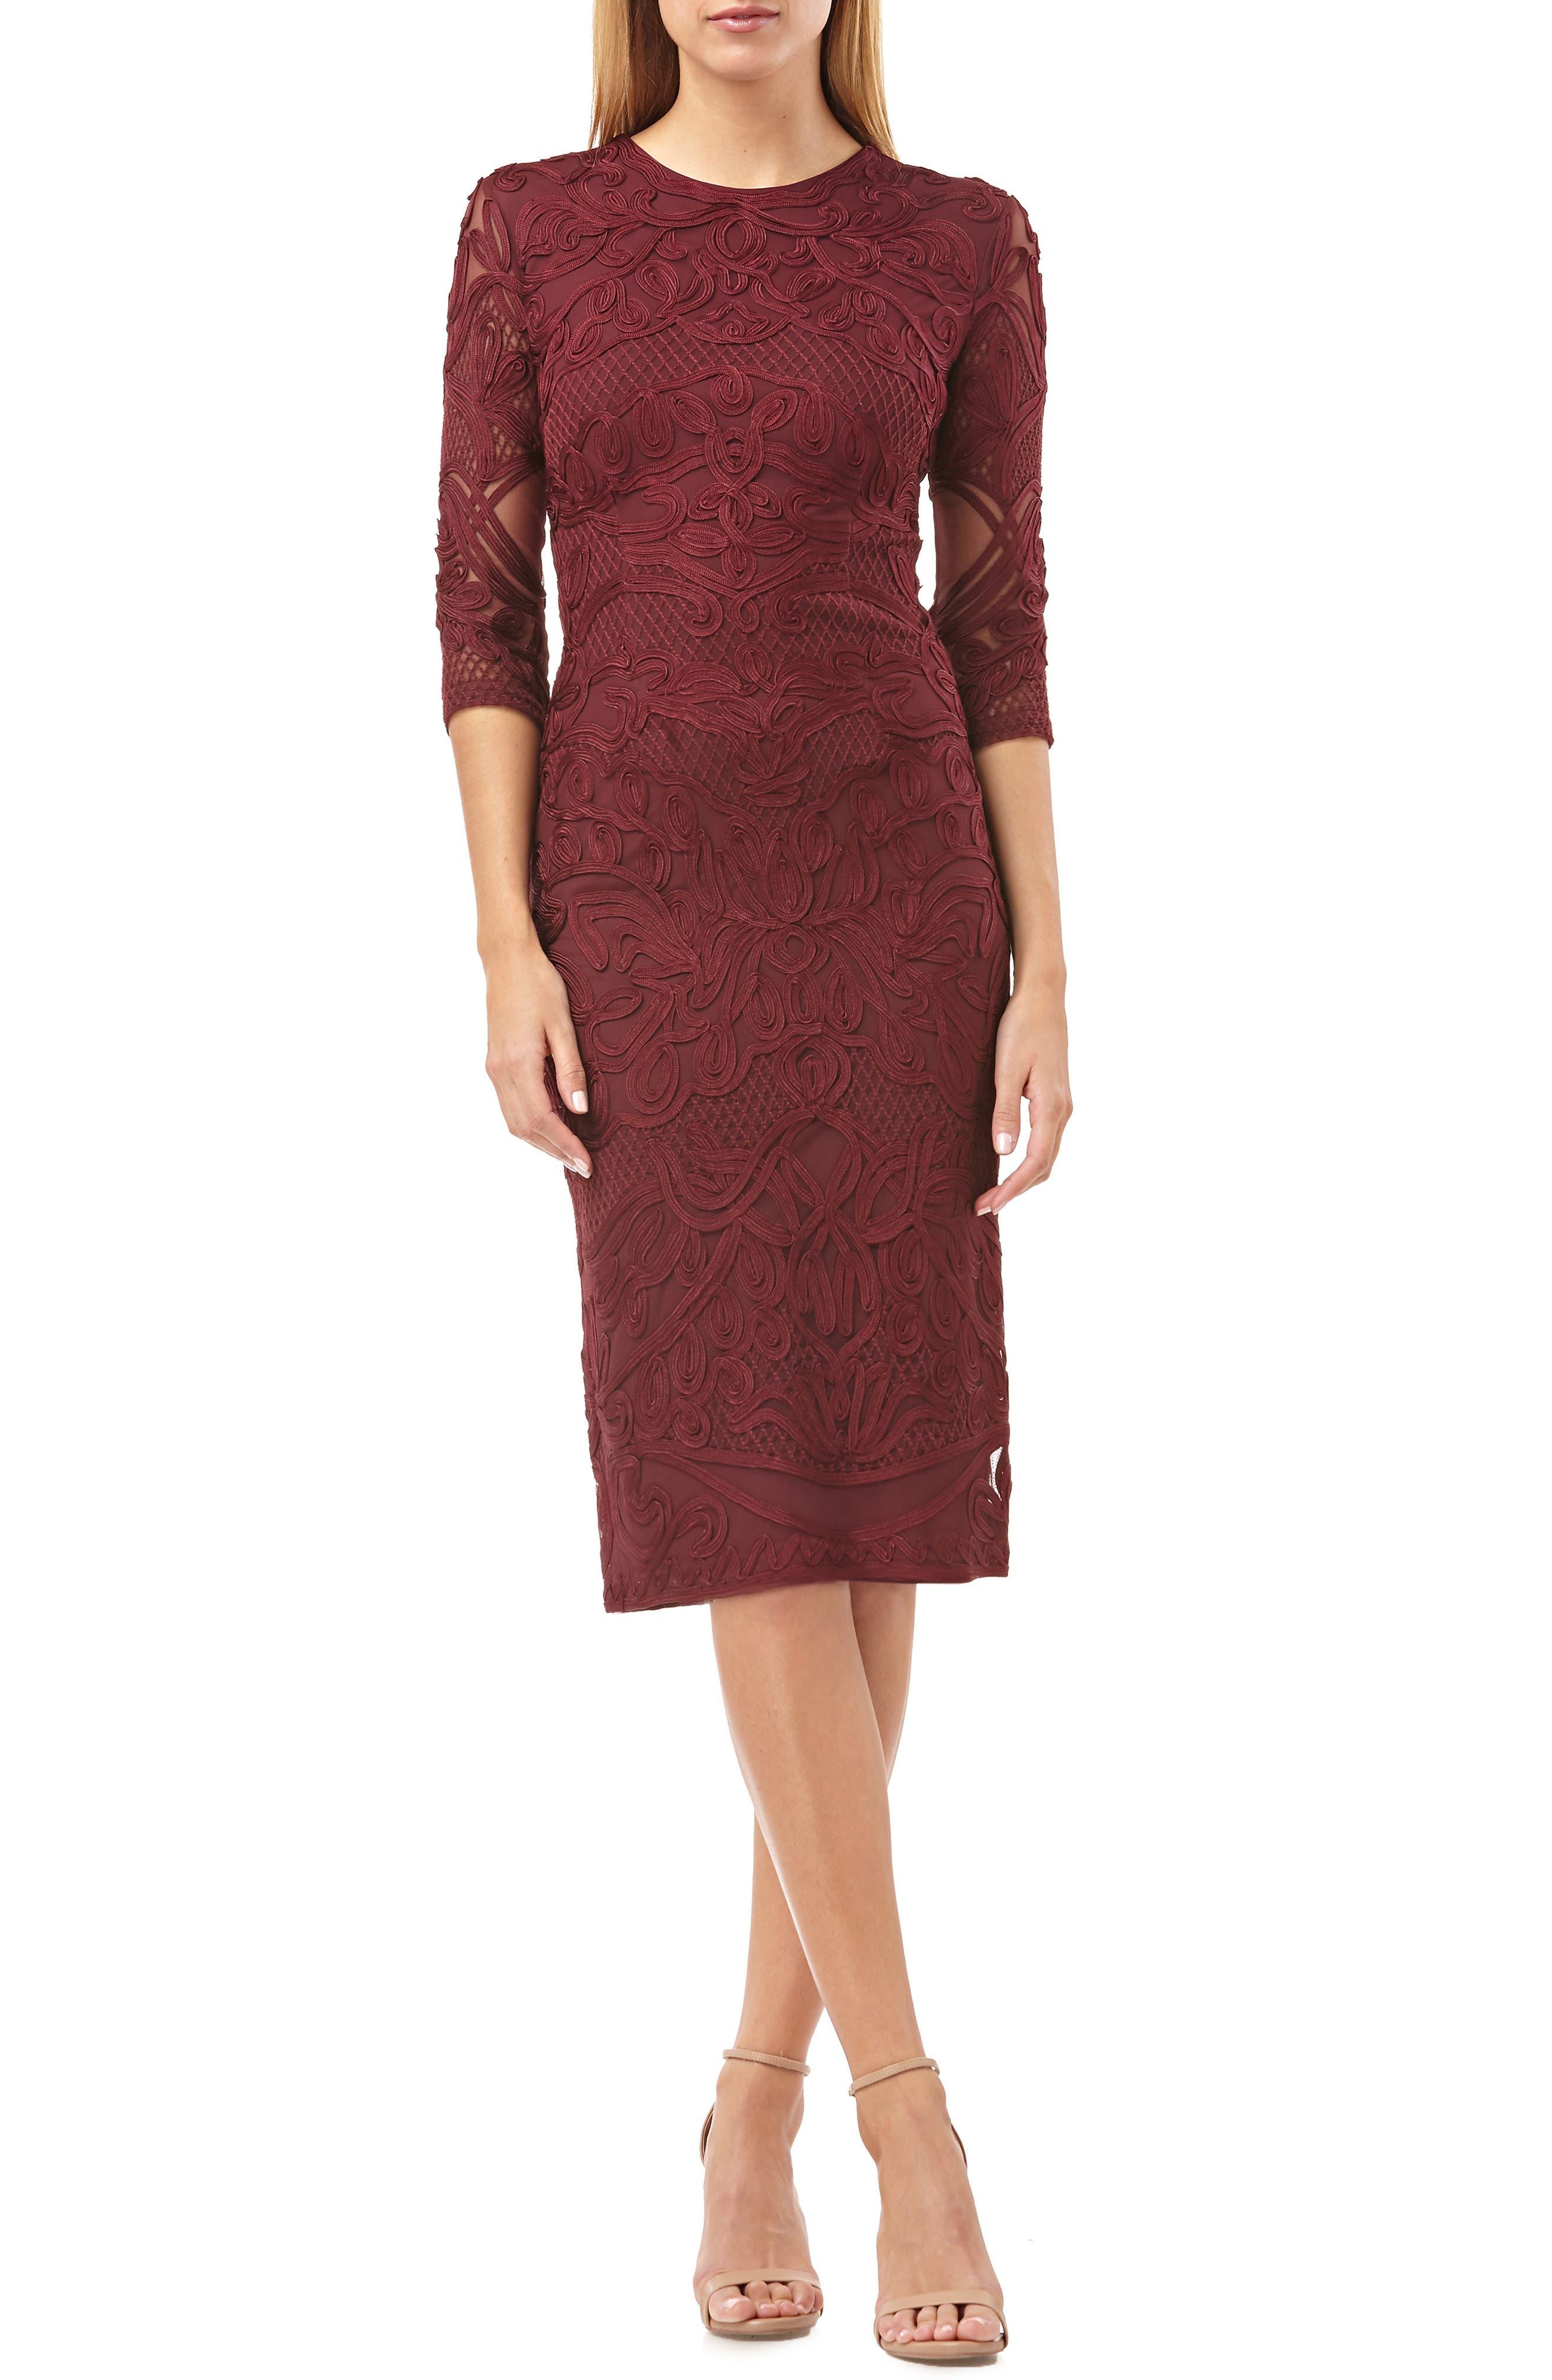 Js Collections Soutache Sheath Dress, Burgundy